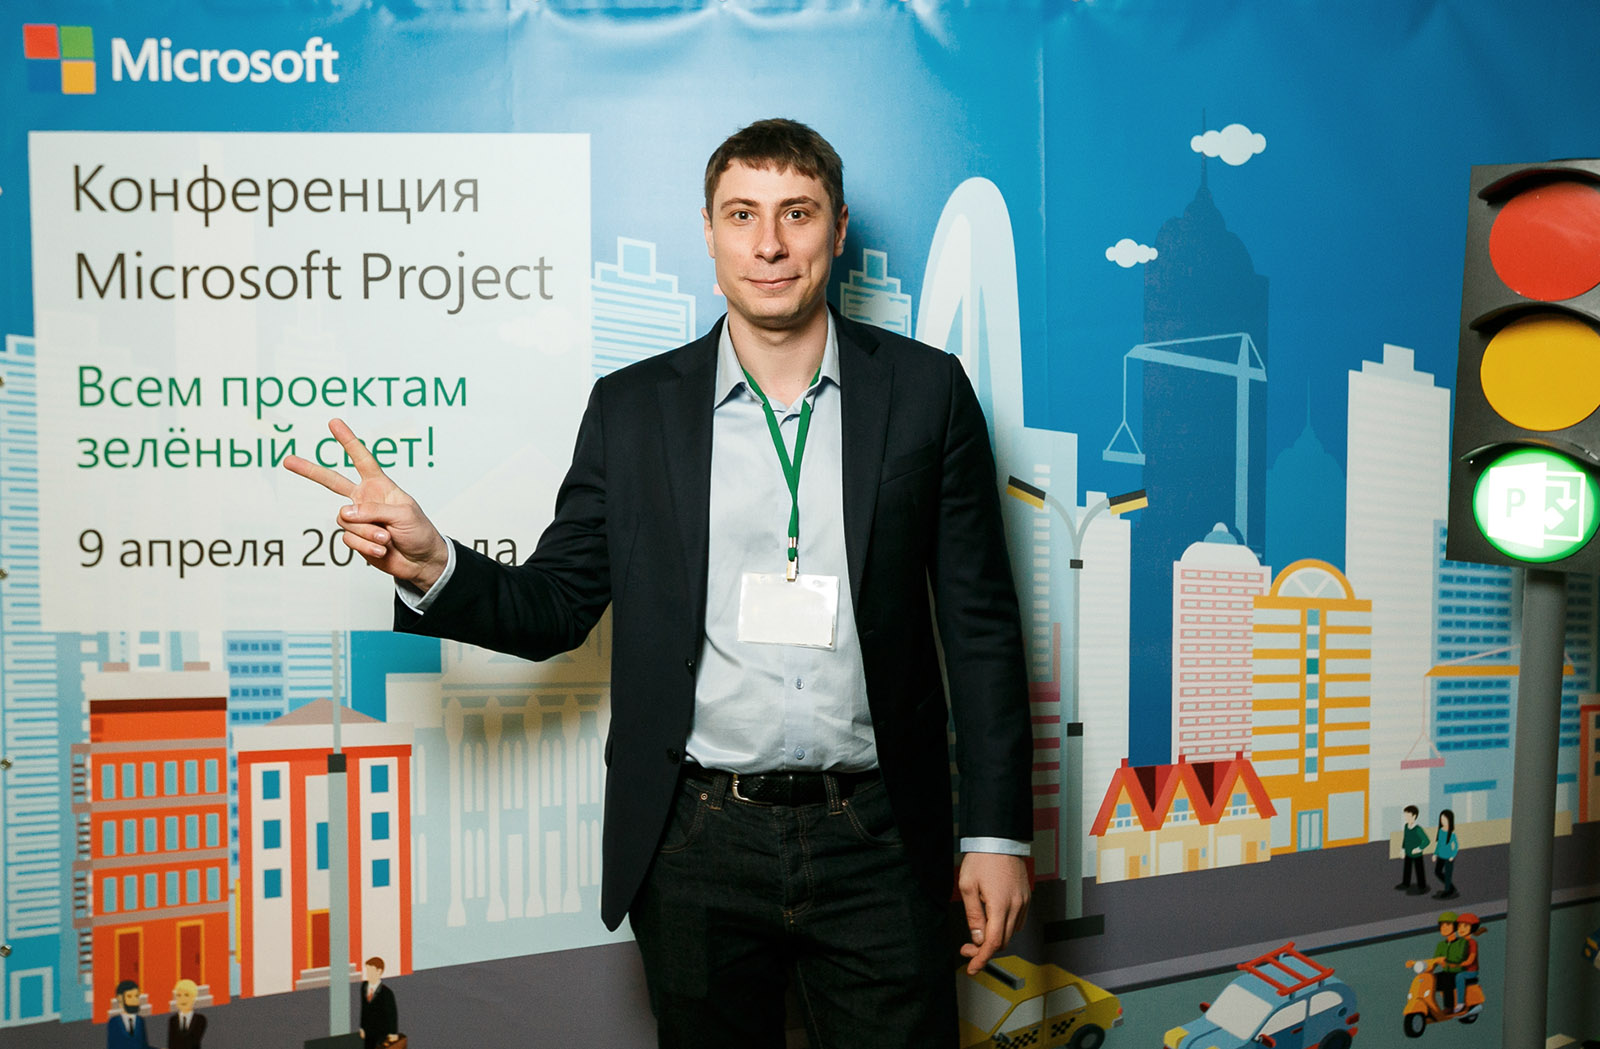 Андрей Путин